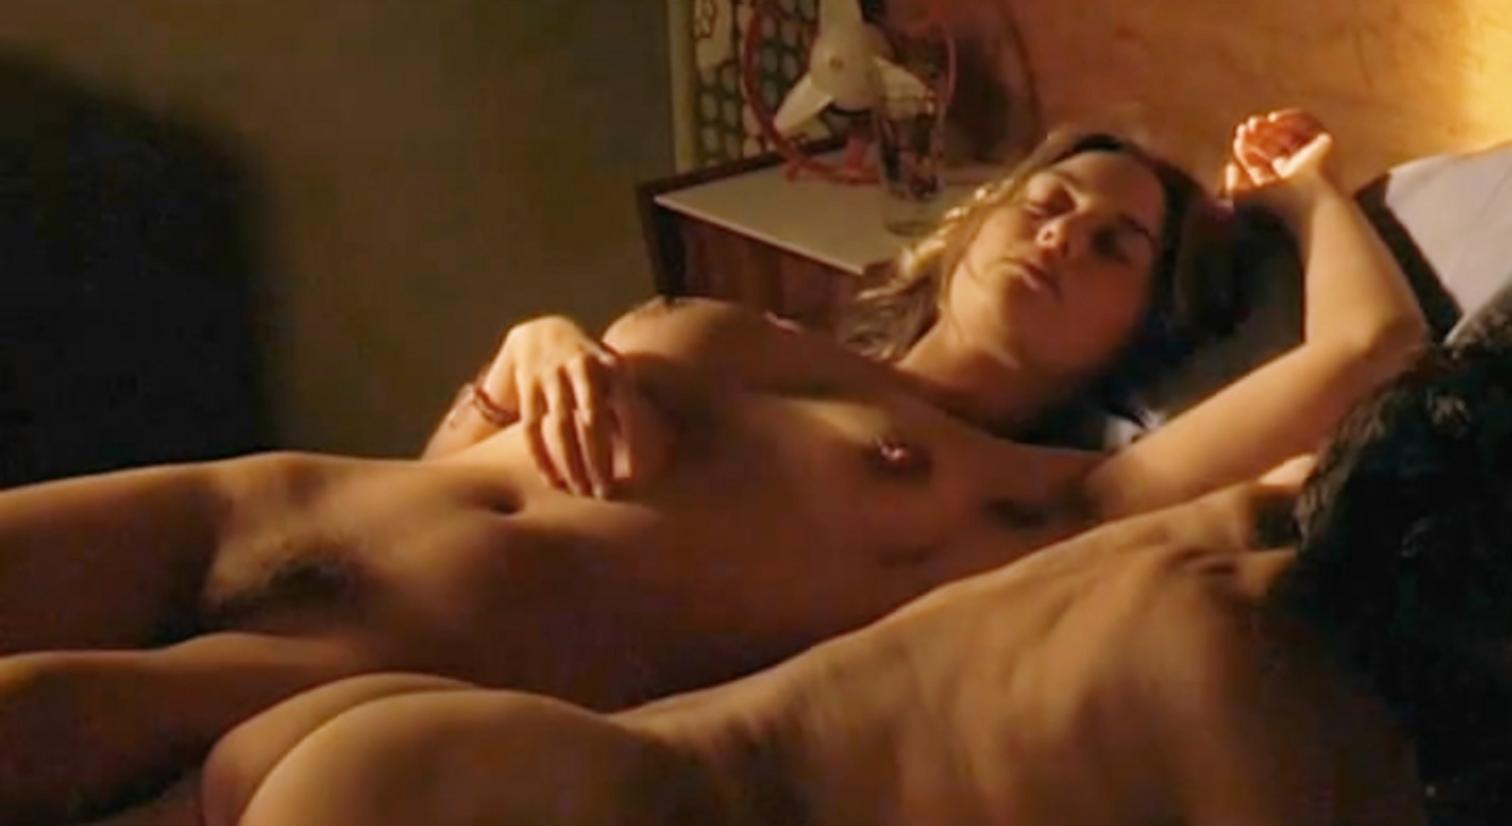 porno-stseni-iz-filmov-znamenitosti